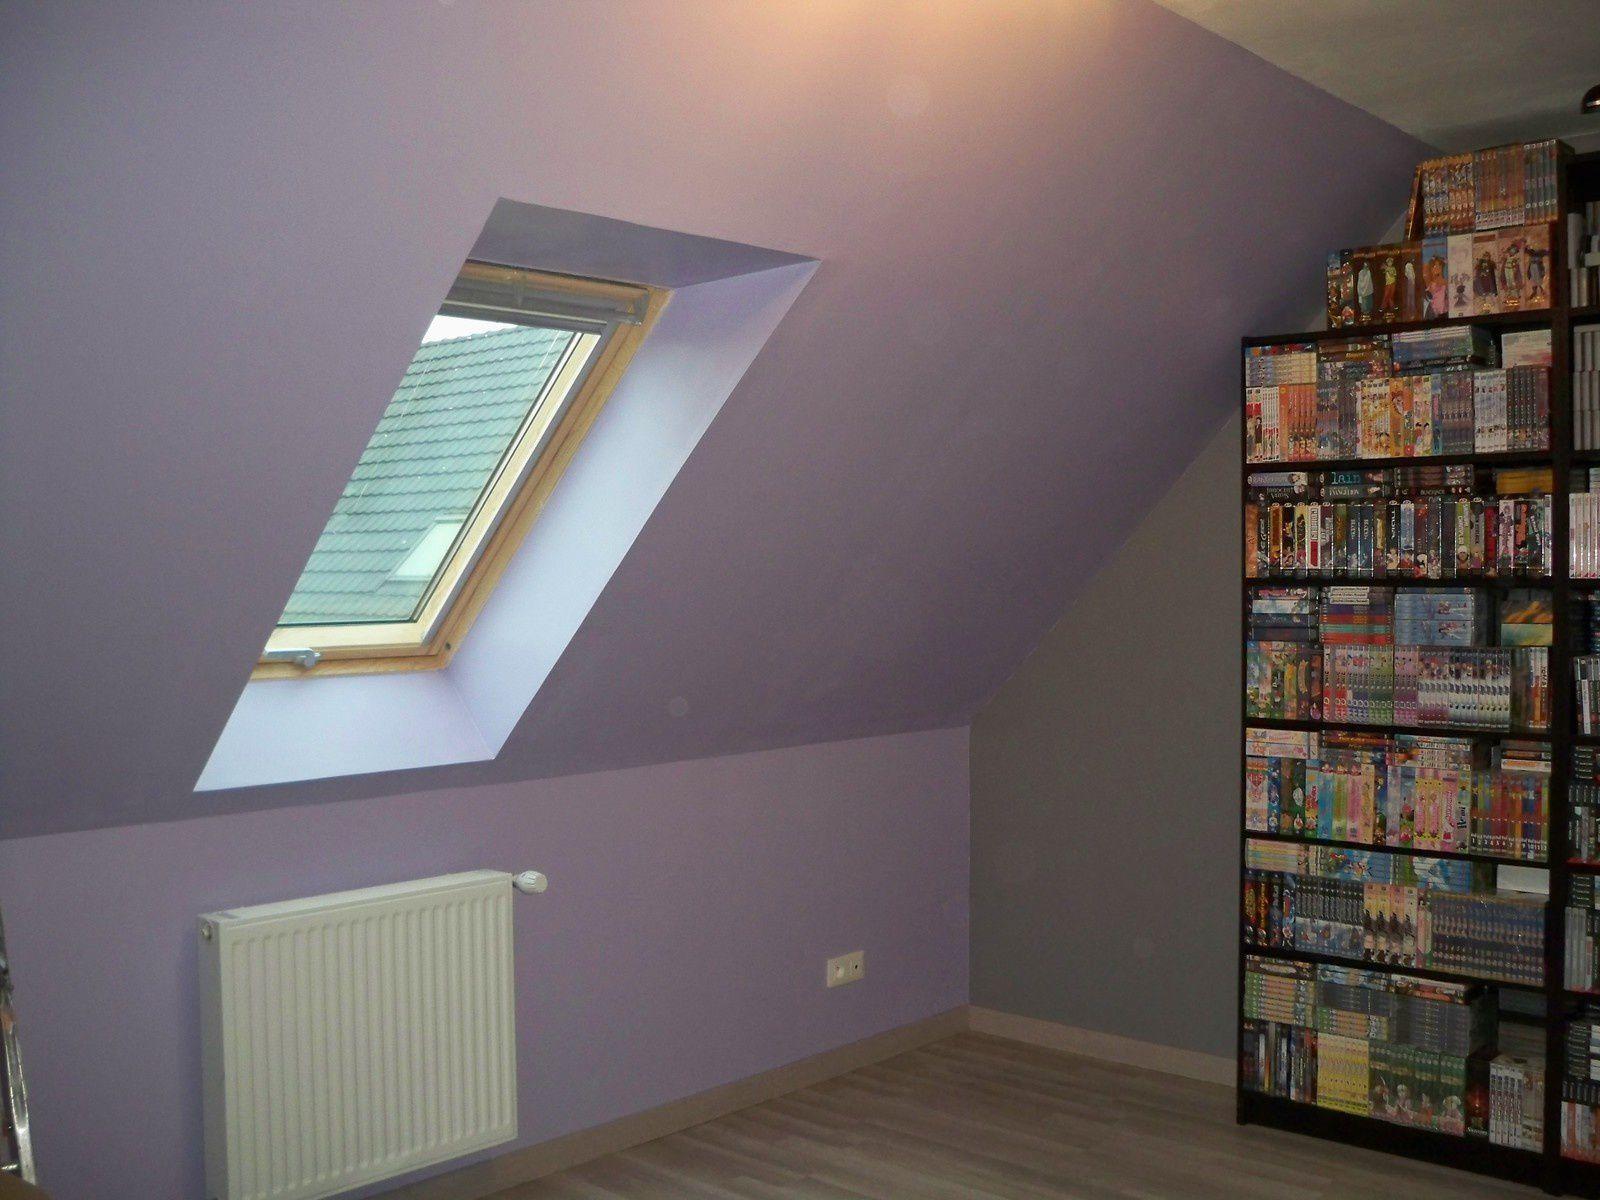 La peinture des chambres : la chambre du bébé : bleu et lin la ...